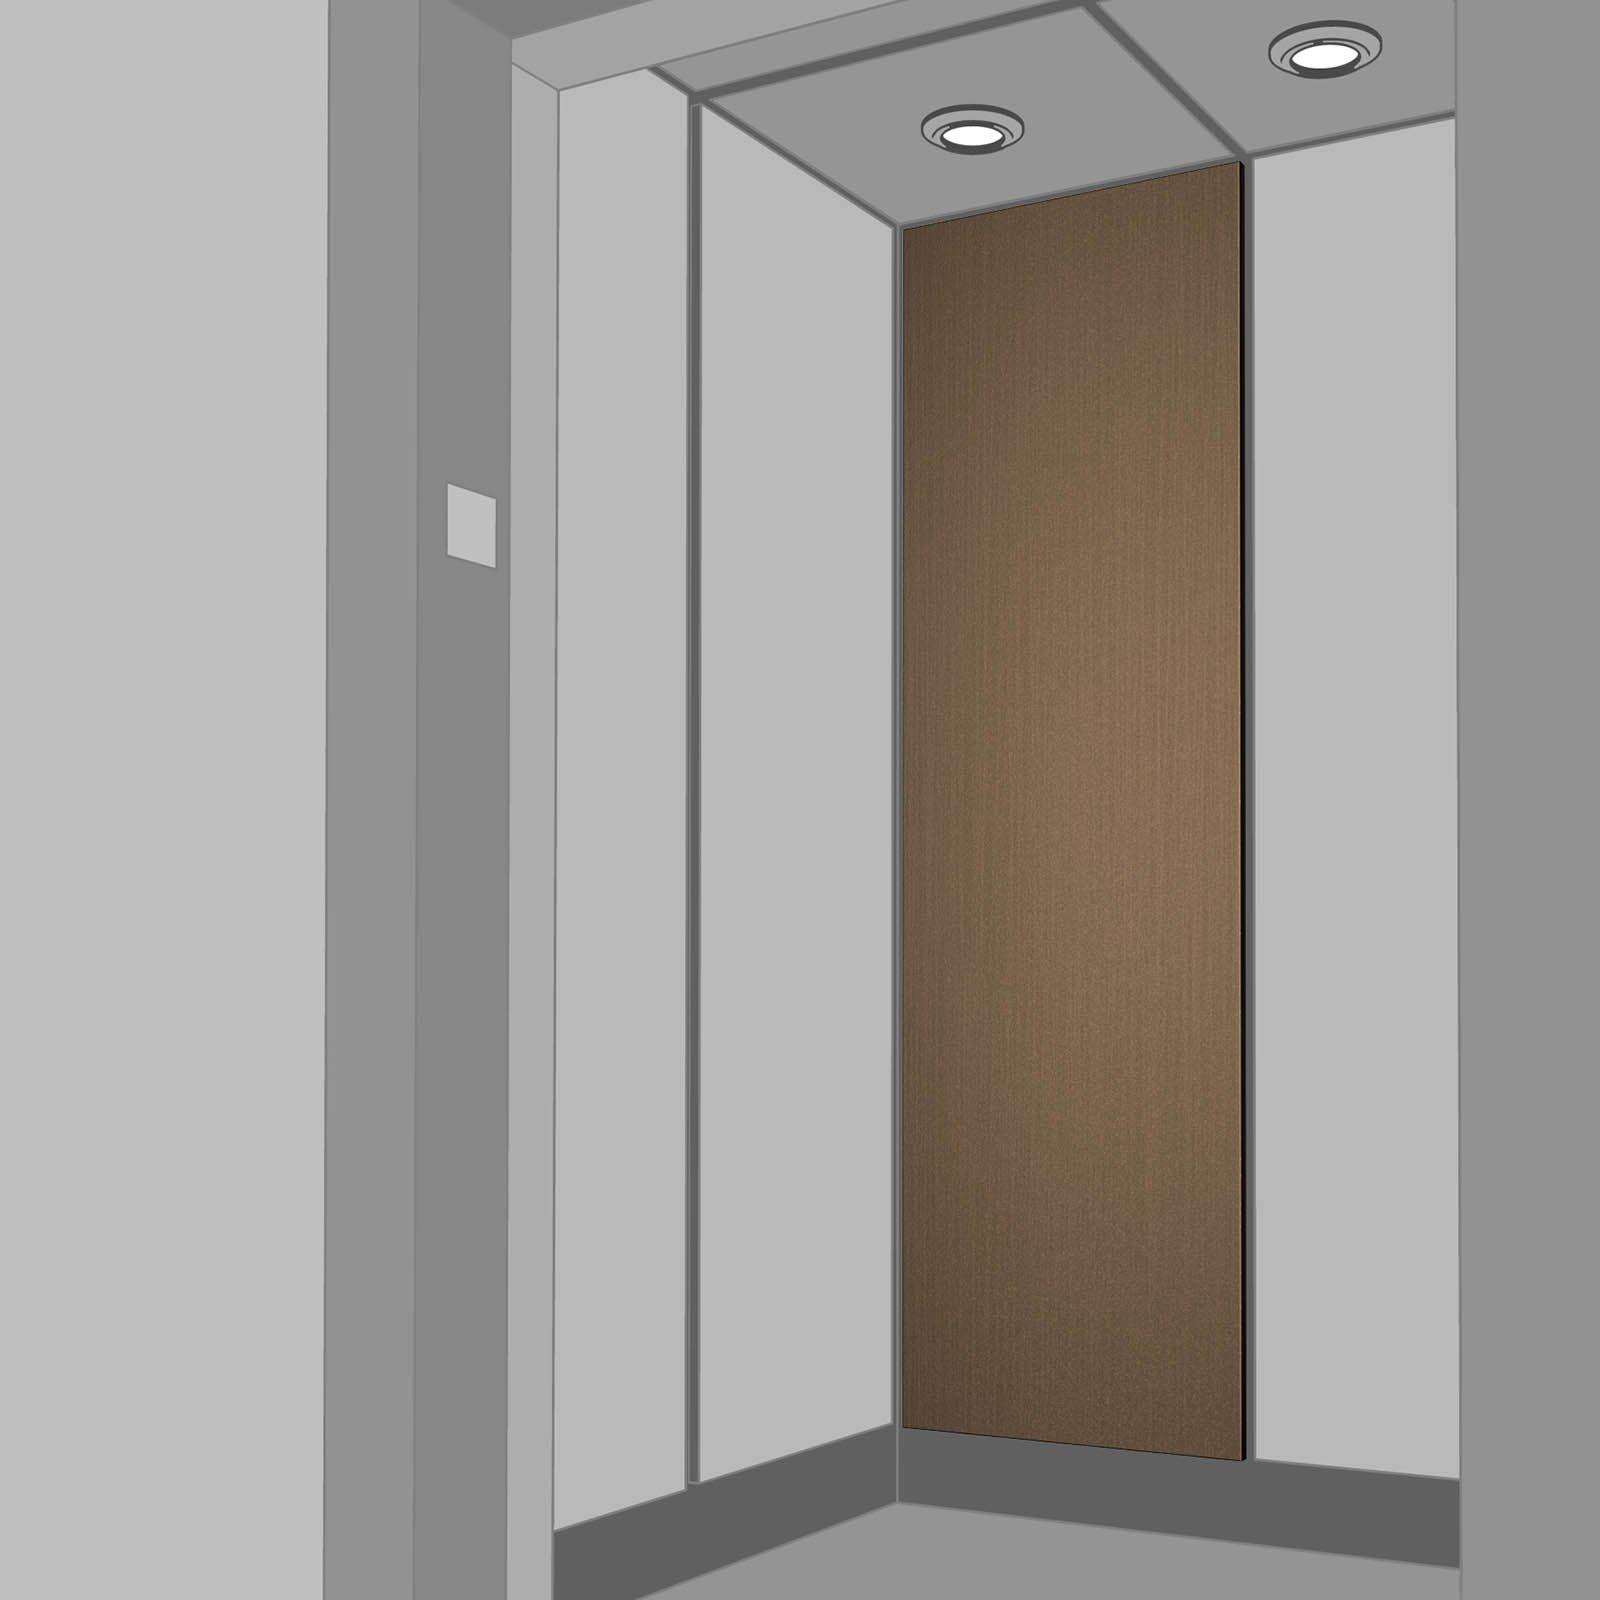 IndustryHeros_1600x1600_0002_Elevator_2020